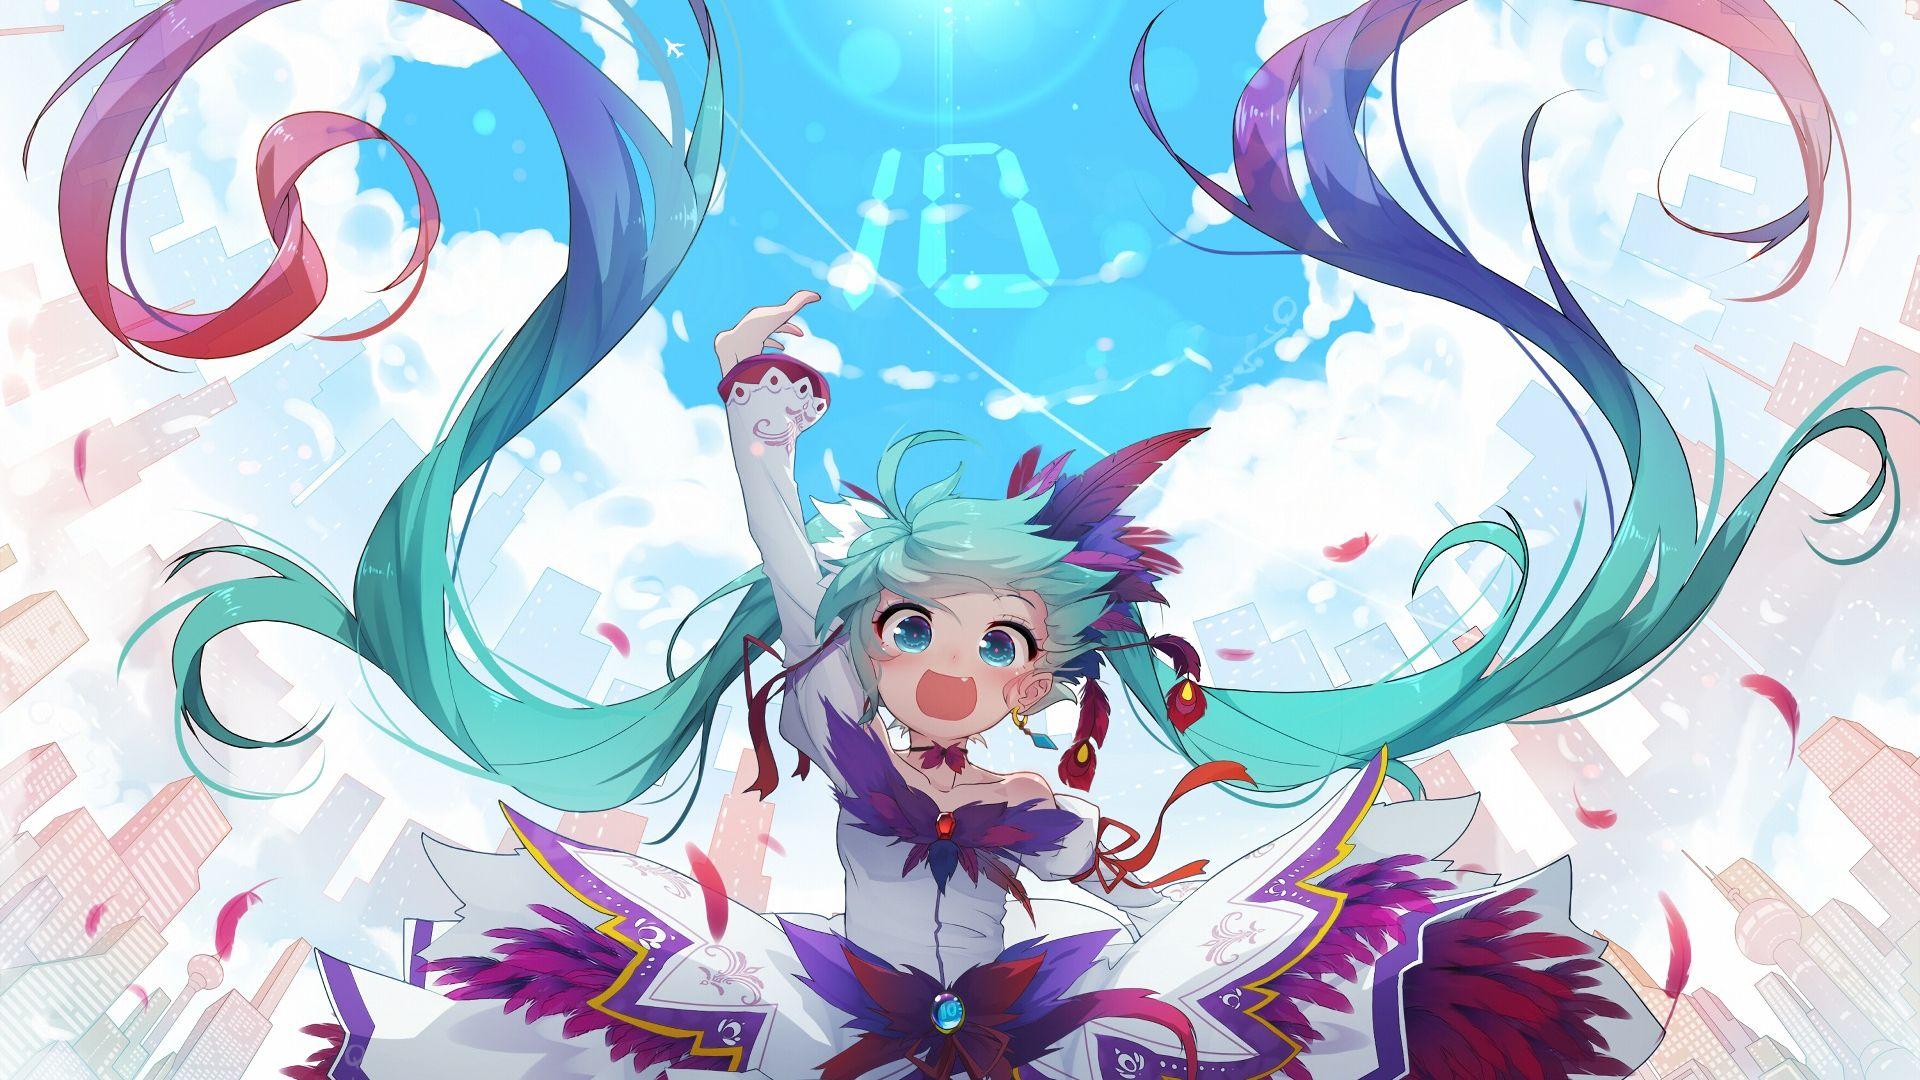 Desktop Wallpaper Enjoy Jump Hatsune Miku Anime Girl Hd Image Picture Background A33720